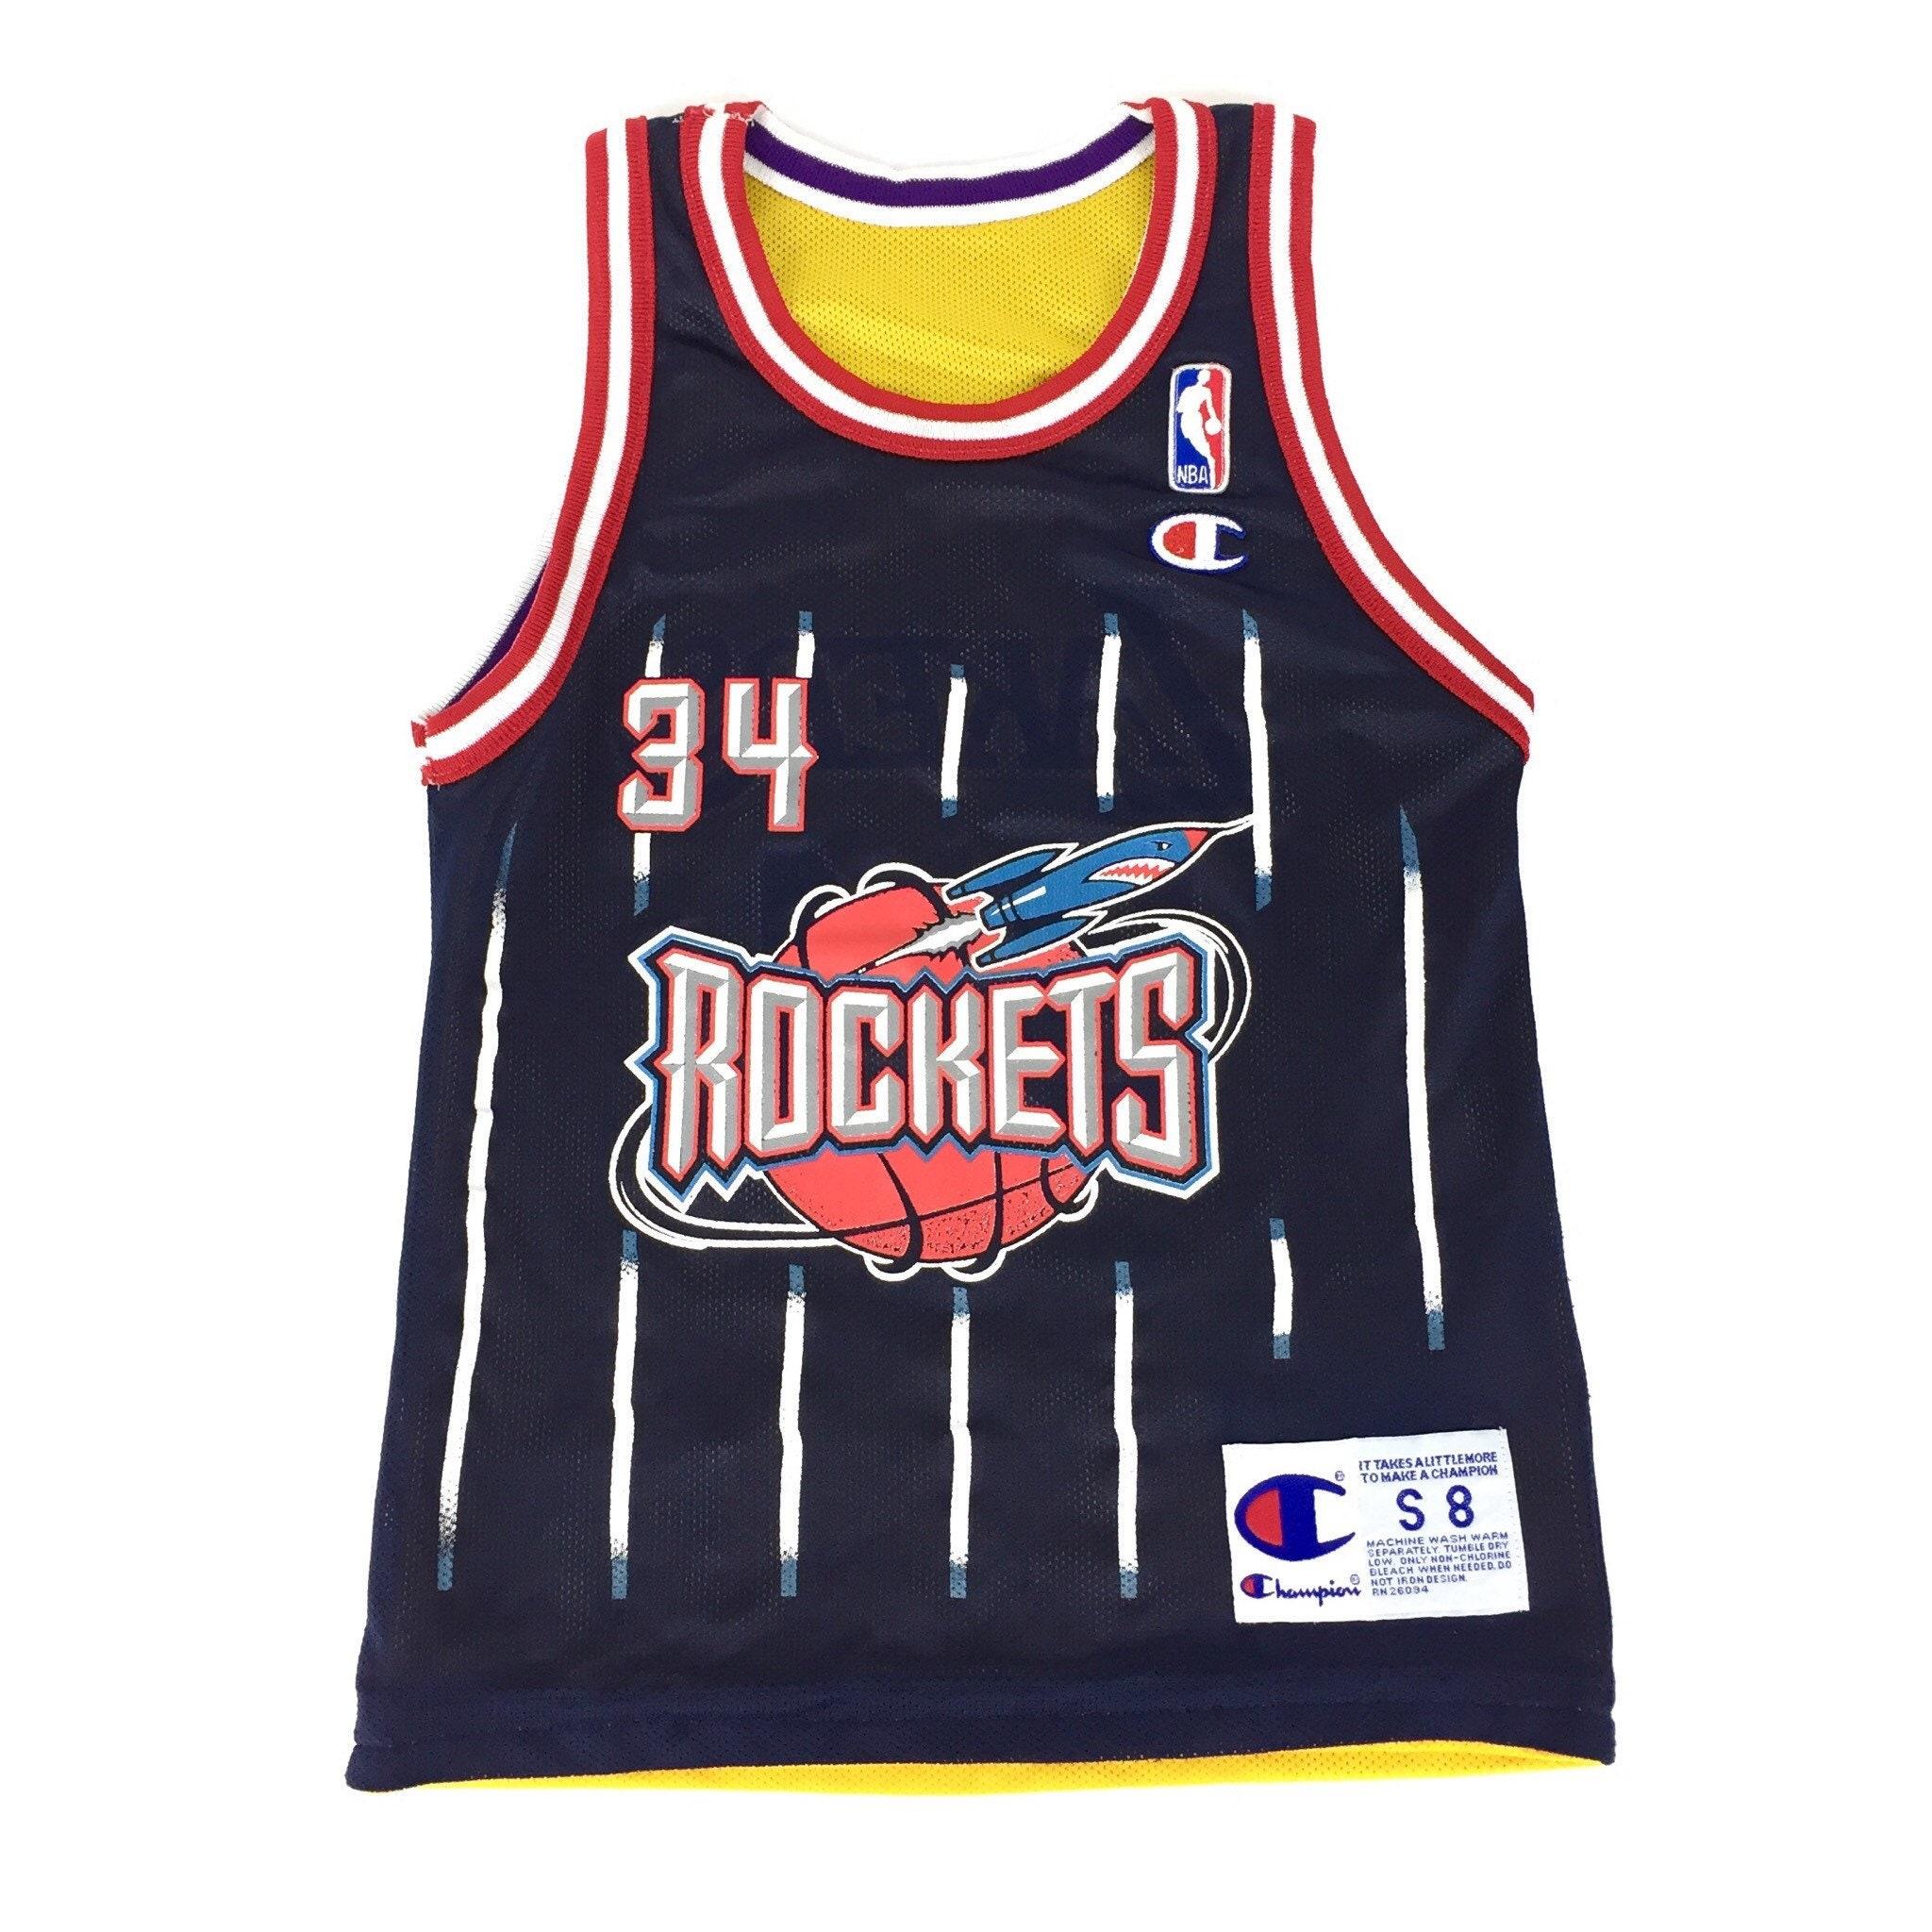 4746a5dea187 Rare Vintage 90s Champion NBA Houston Rockets Los Angeles Lakers Hakeem  Olajuwon Shaq O Neal reversible basketball jersey - Size Youth S 8